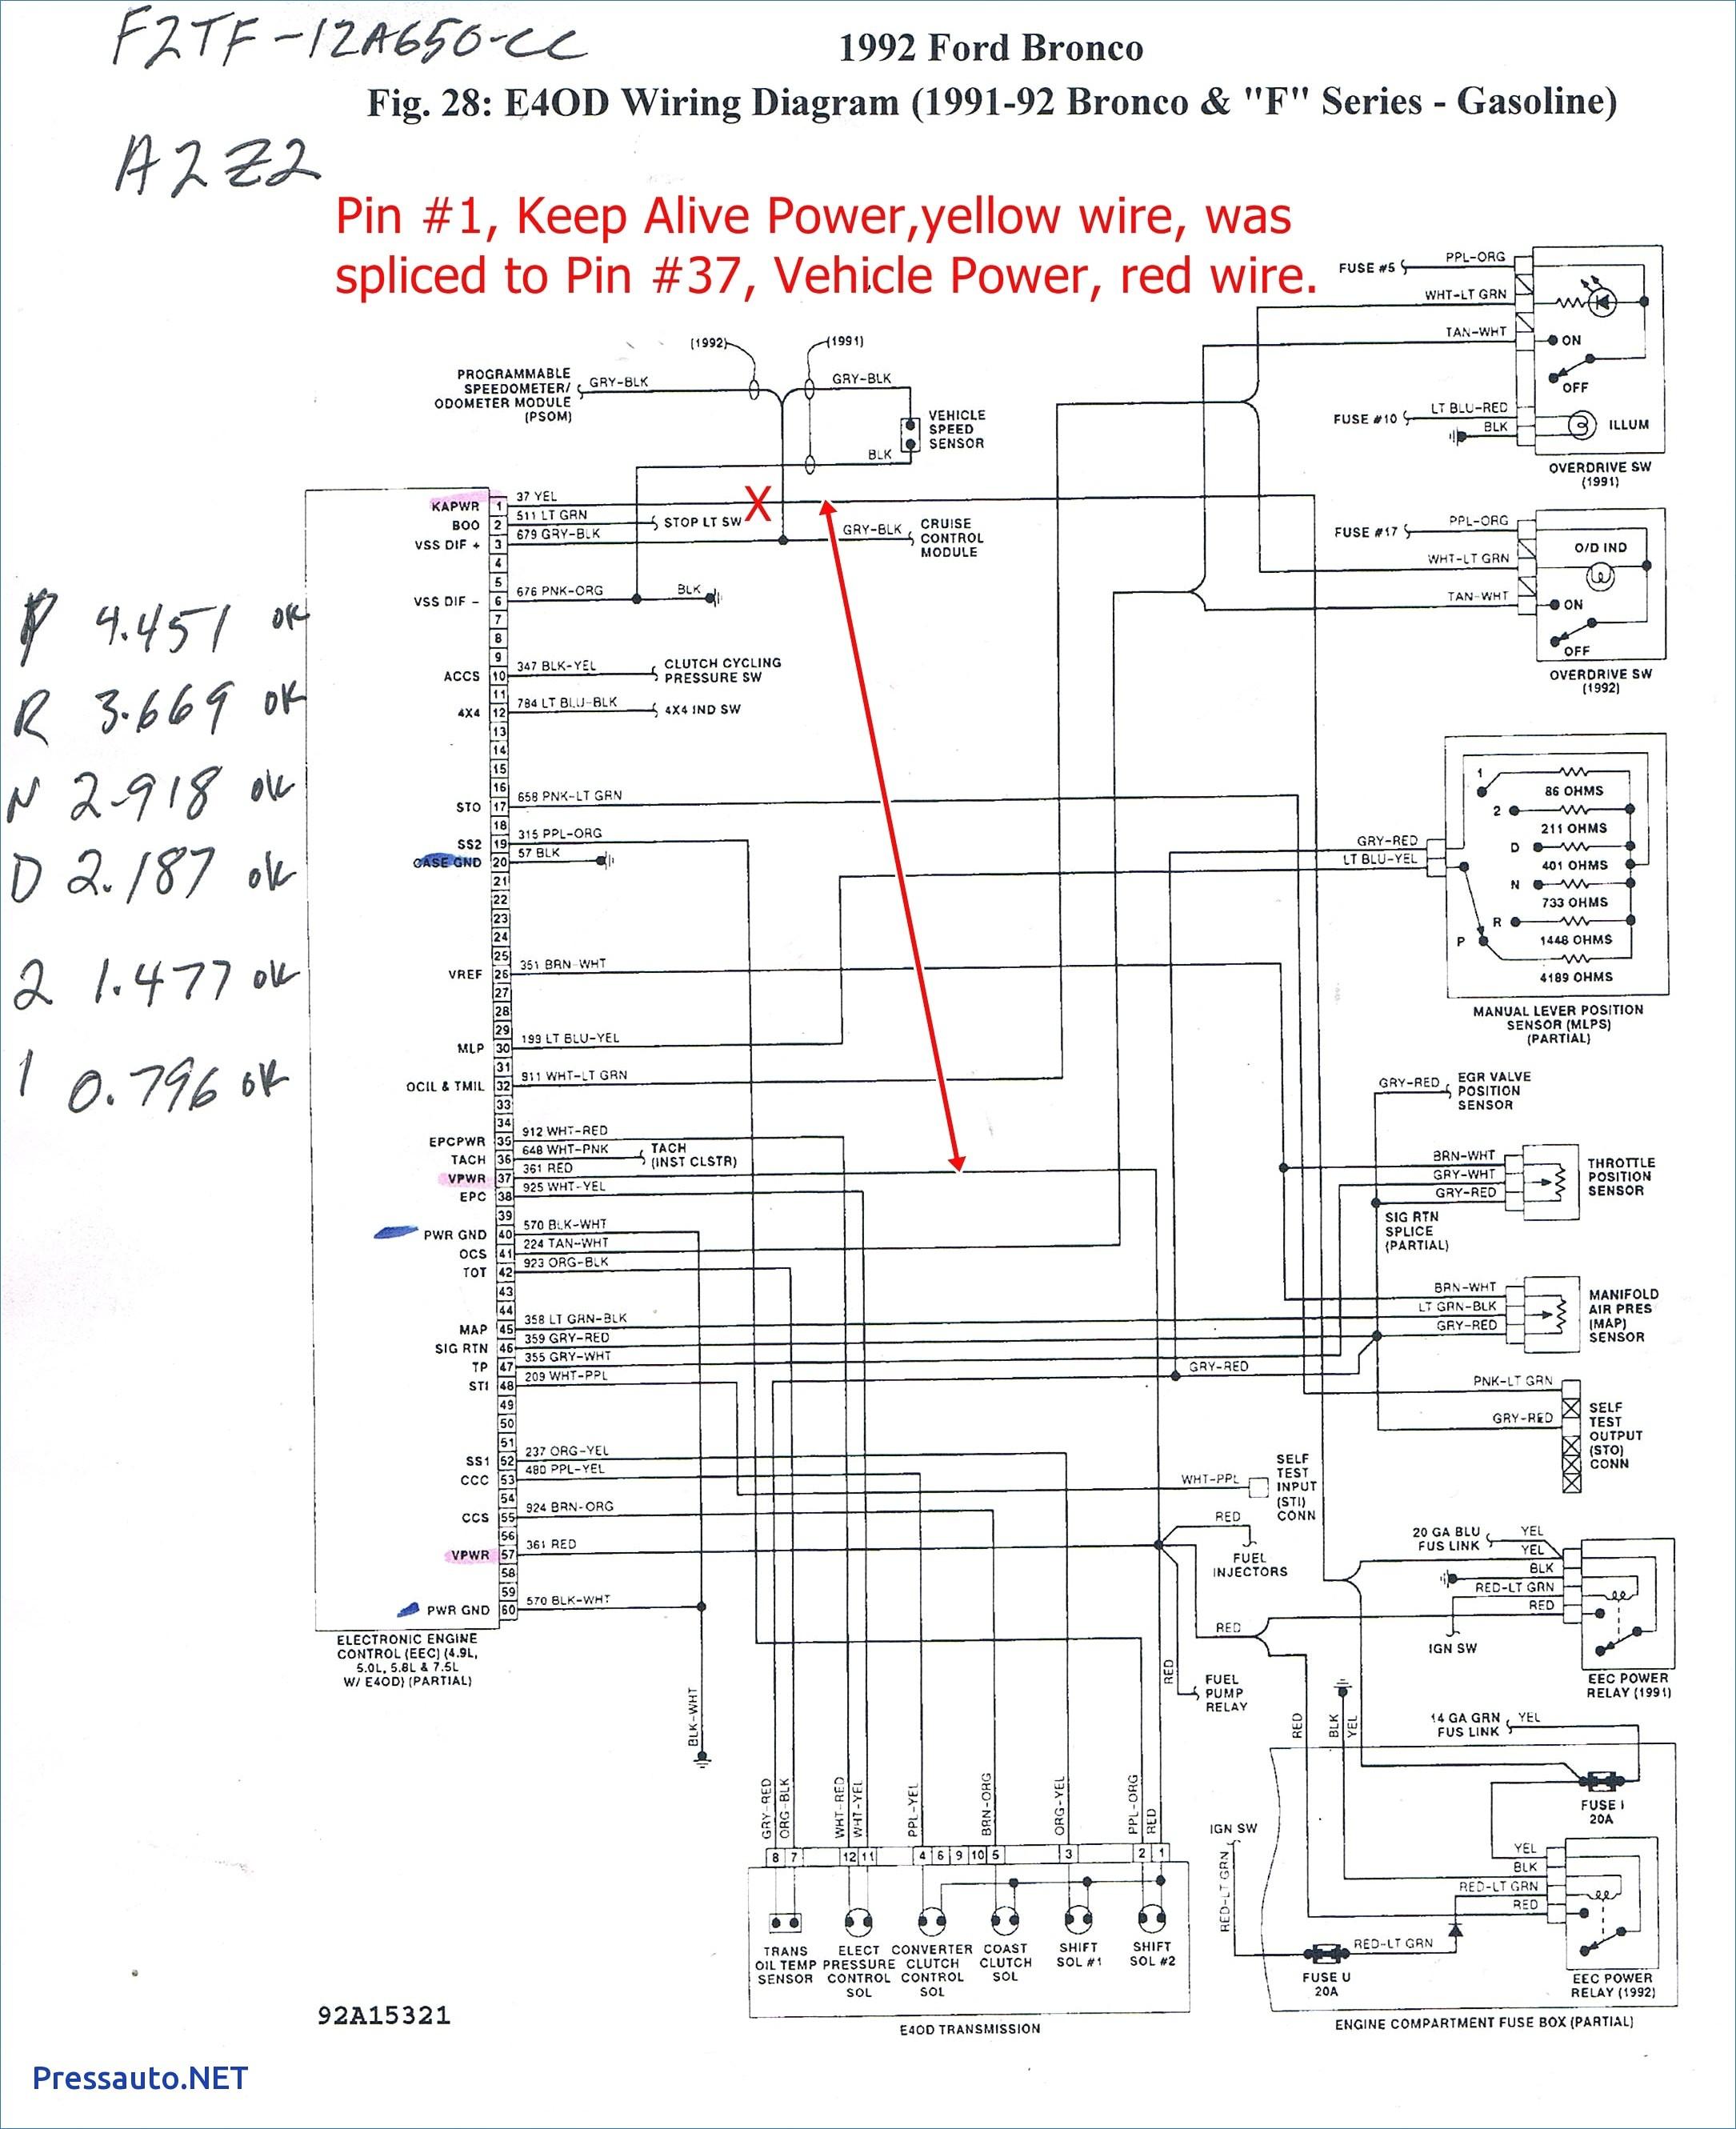 [DIAGRAM_1CA]  2000 Ford Taurus Power Window Wiring Diagram Bathroom Light Exhaust Fan And  Heater Wiring Diagram - naruto.art-40.autoprestige-utilitaire.fr | 2000 Ford Taurus Electrical Schematic |  | Wiring Diagram and Schematics